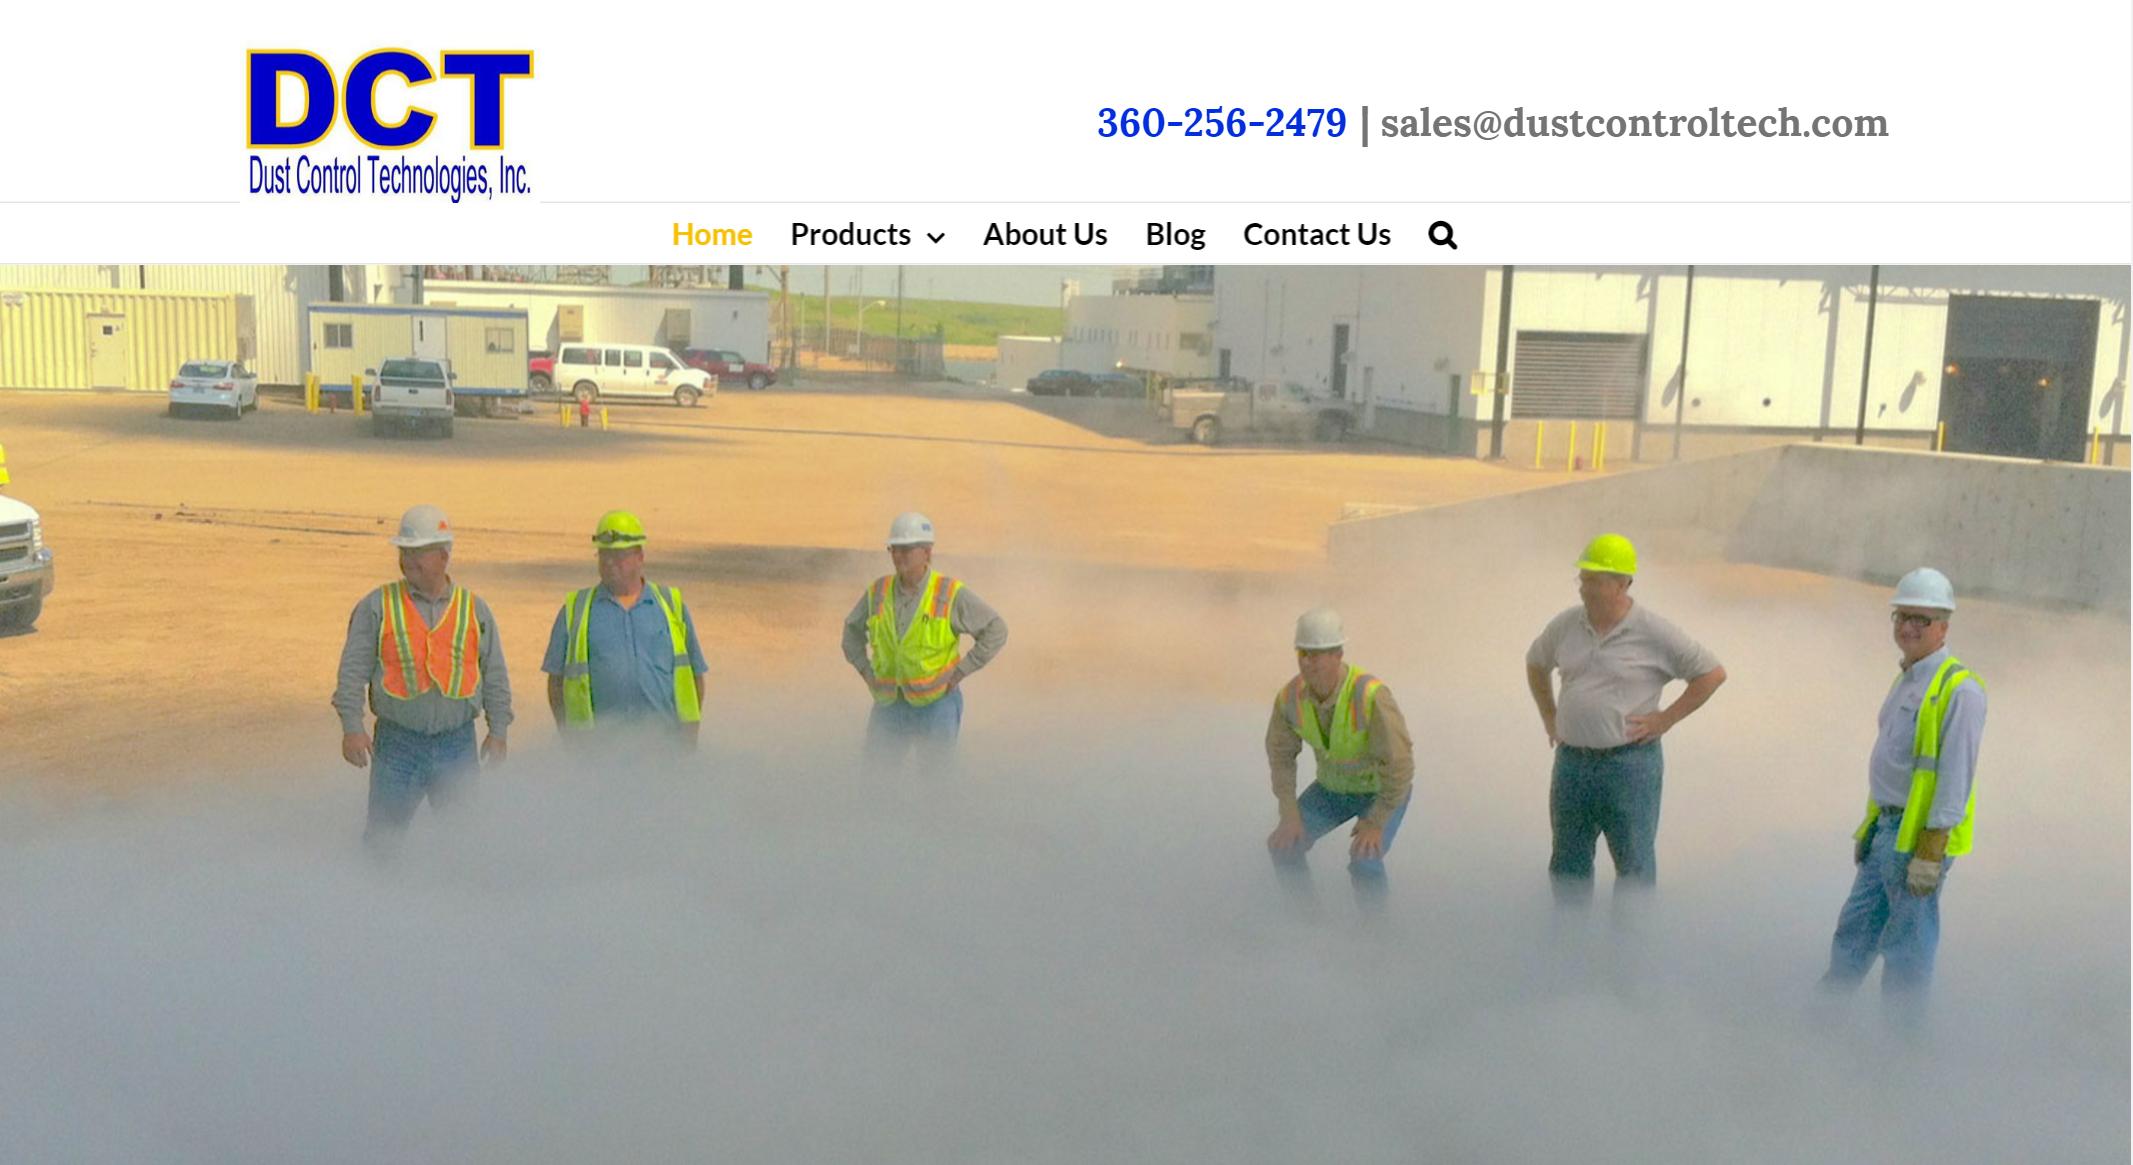 Dust Control Technologies Website